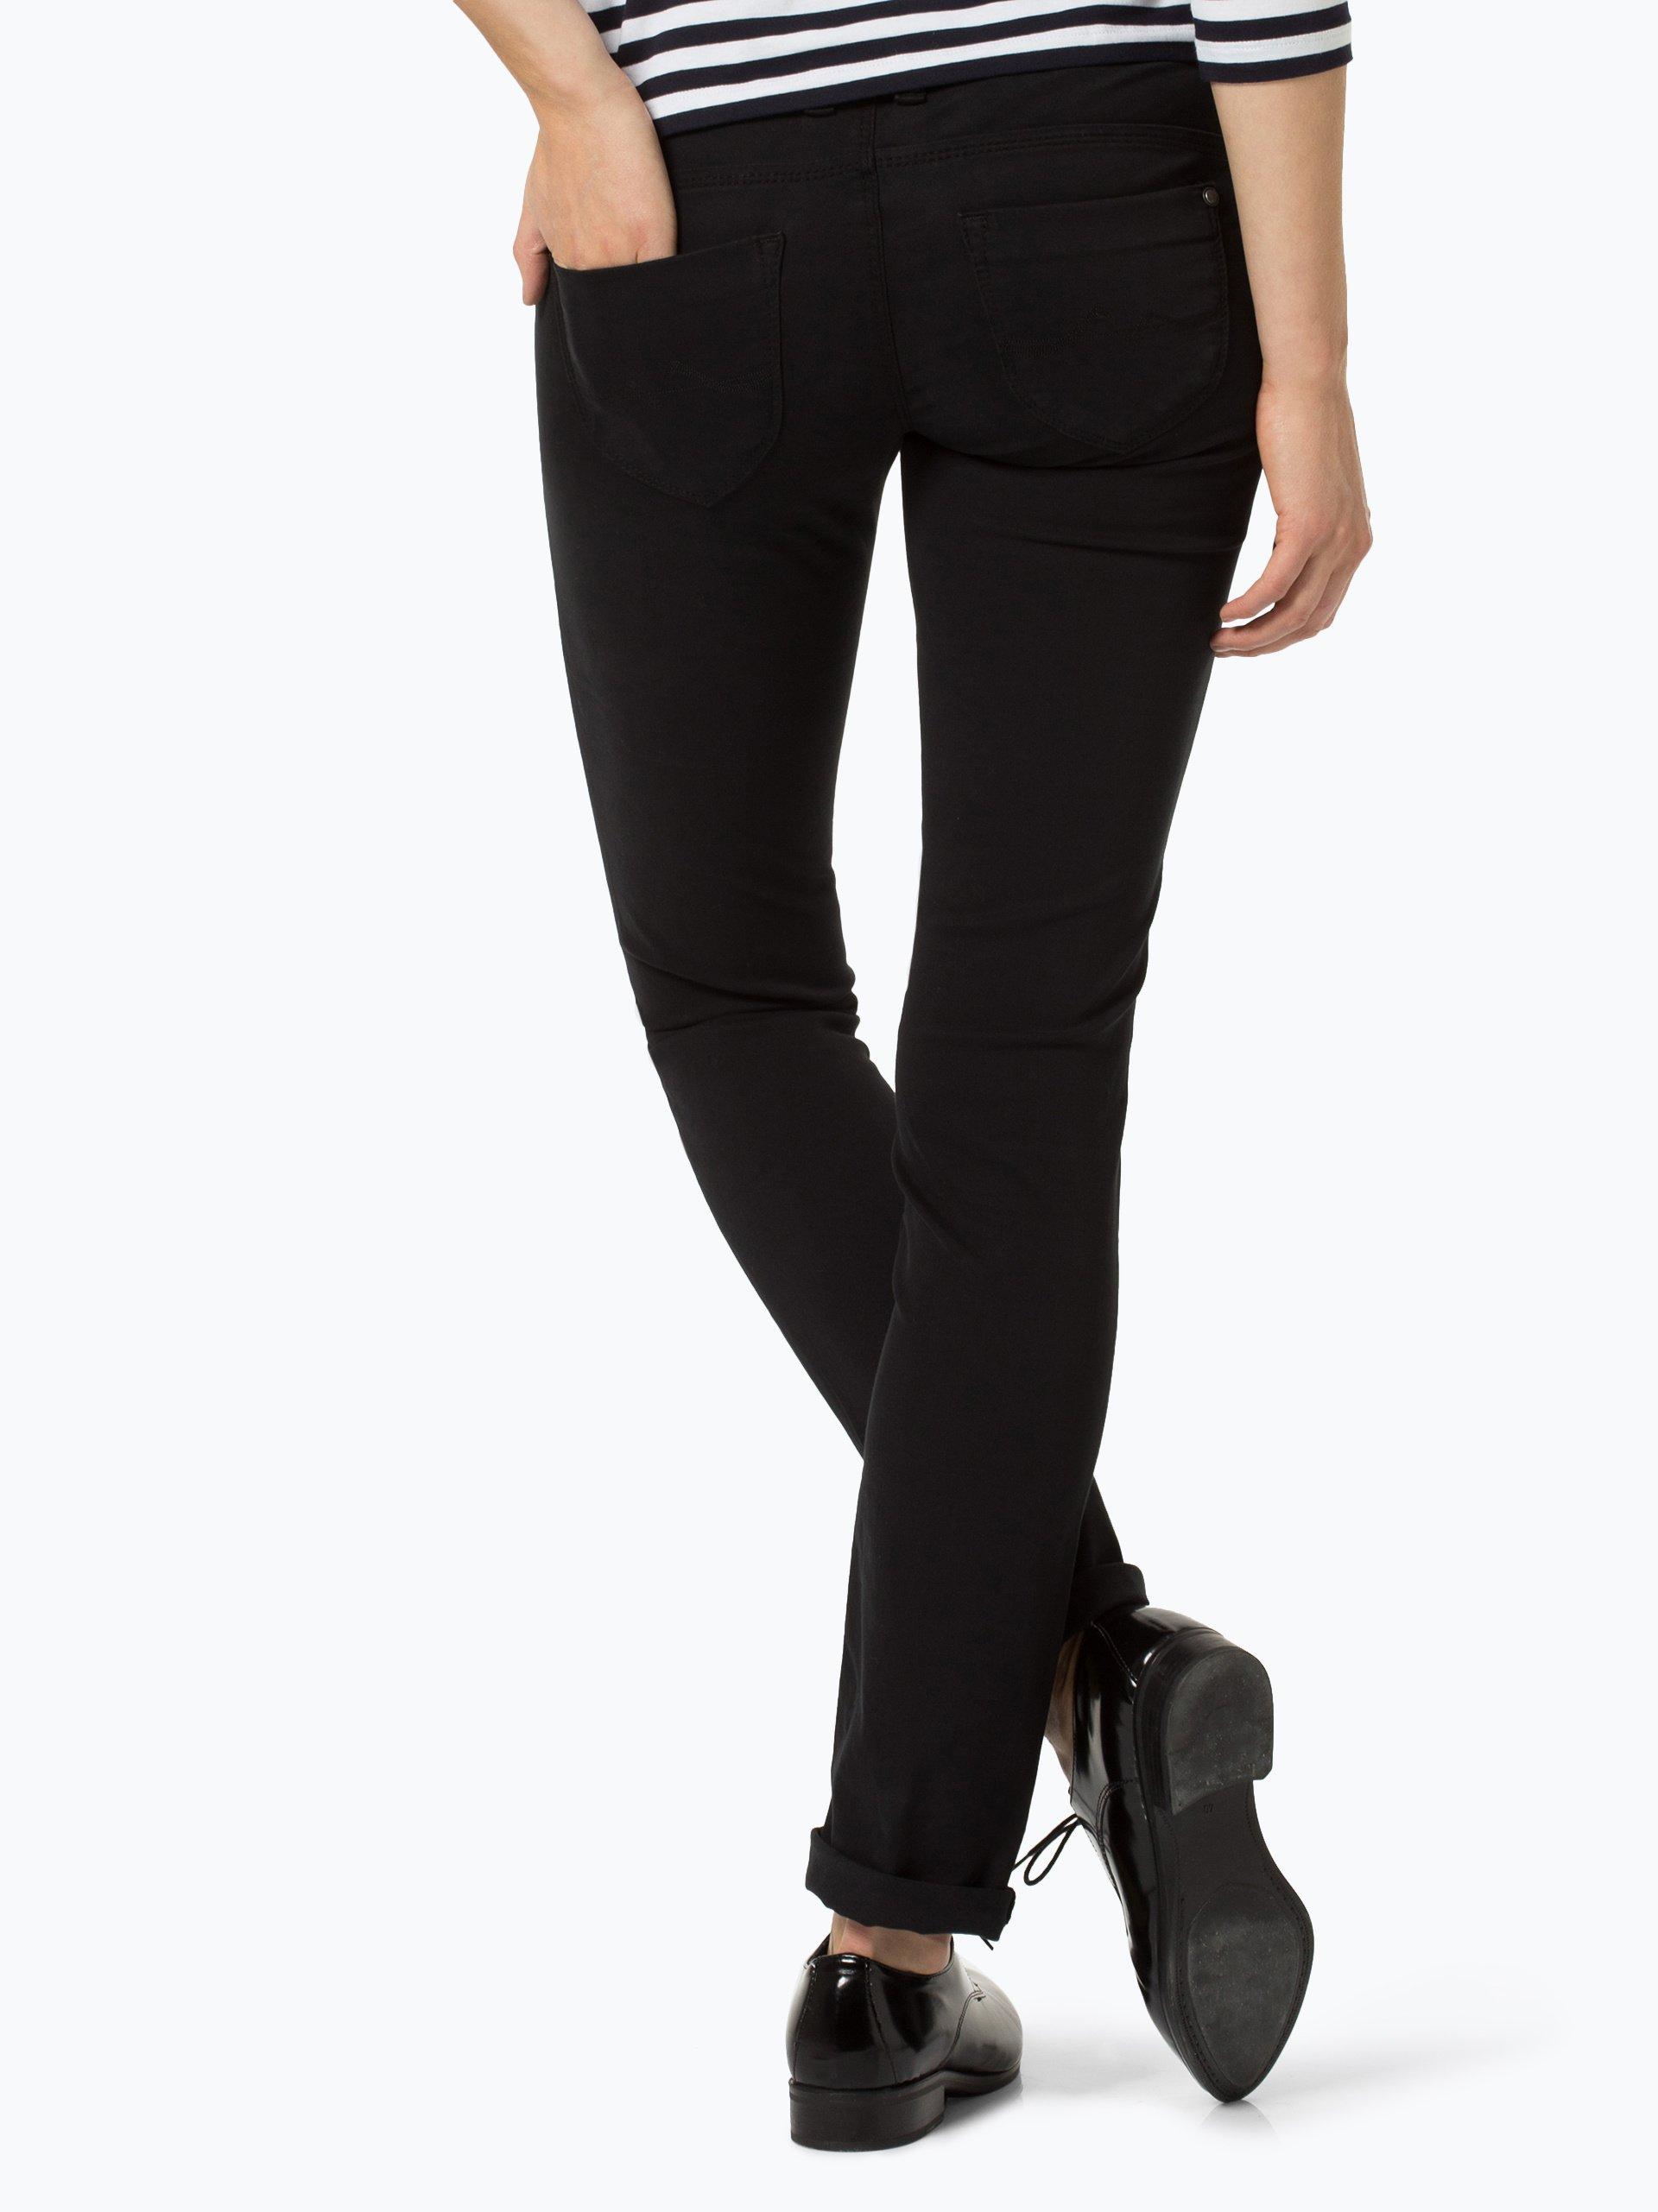 Pepe Jeans Damen Hose - New Brooke